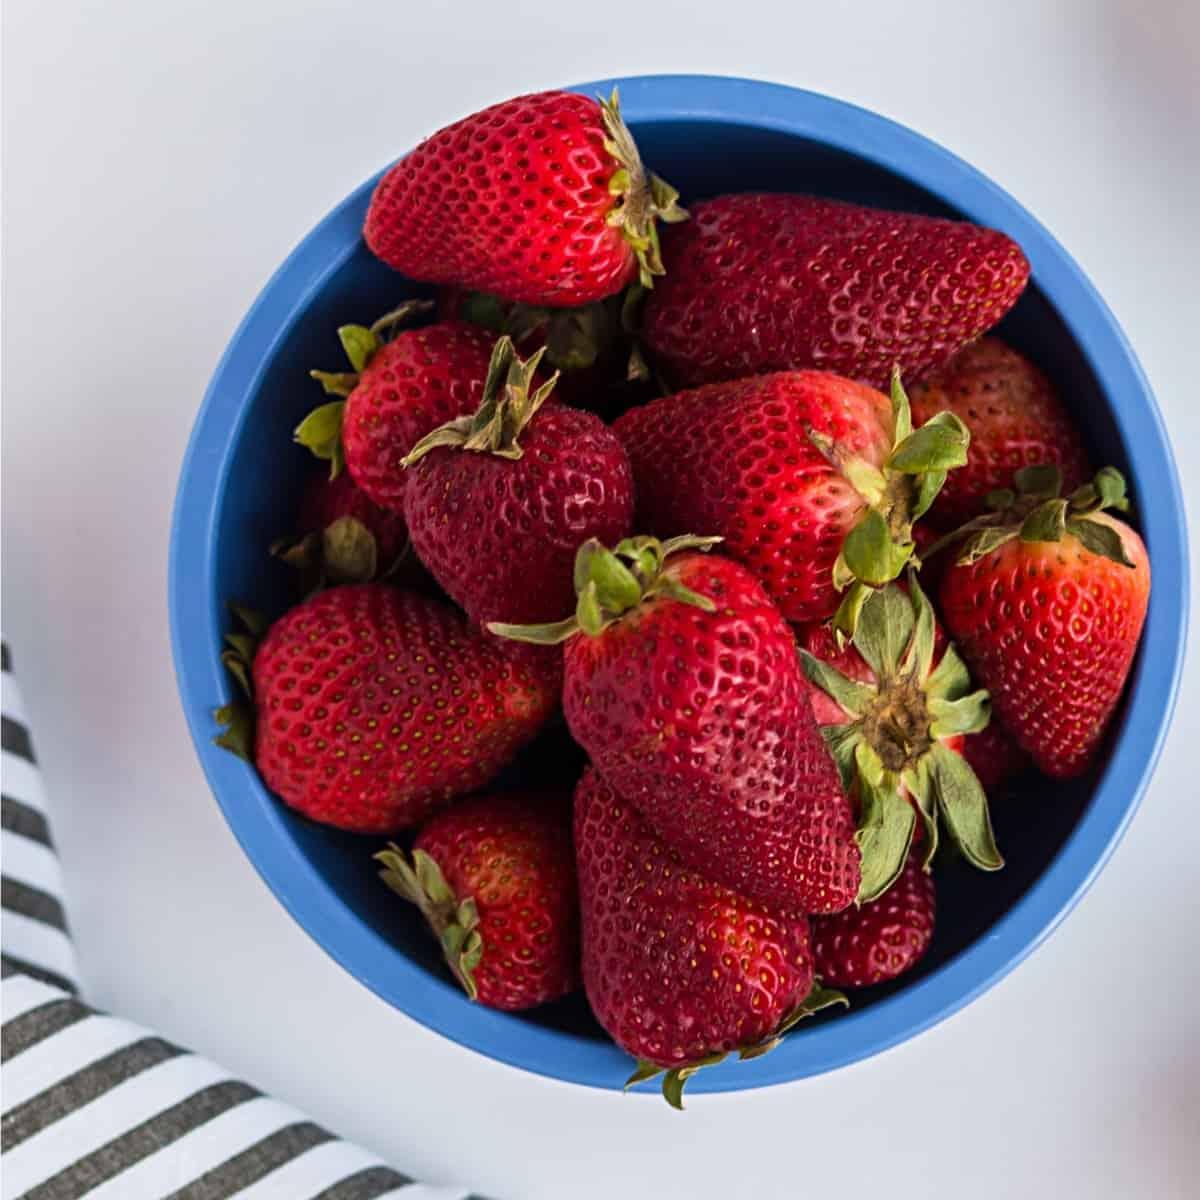 bowl of strawberries to enjoy as keto fruit